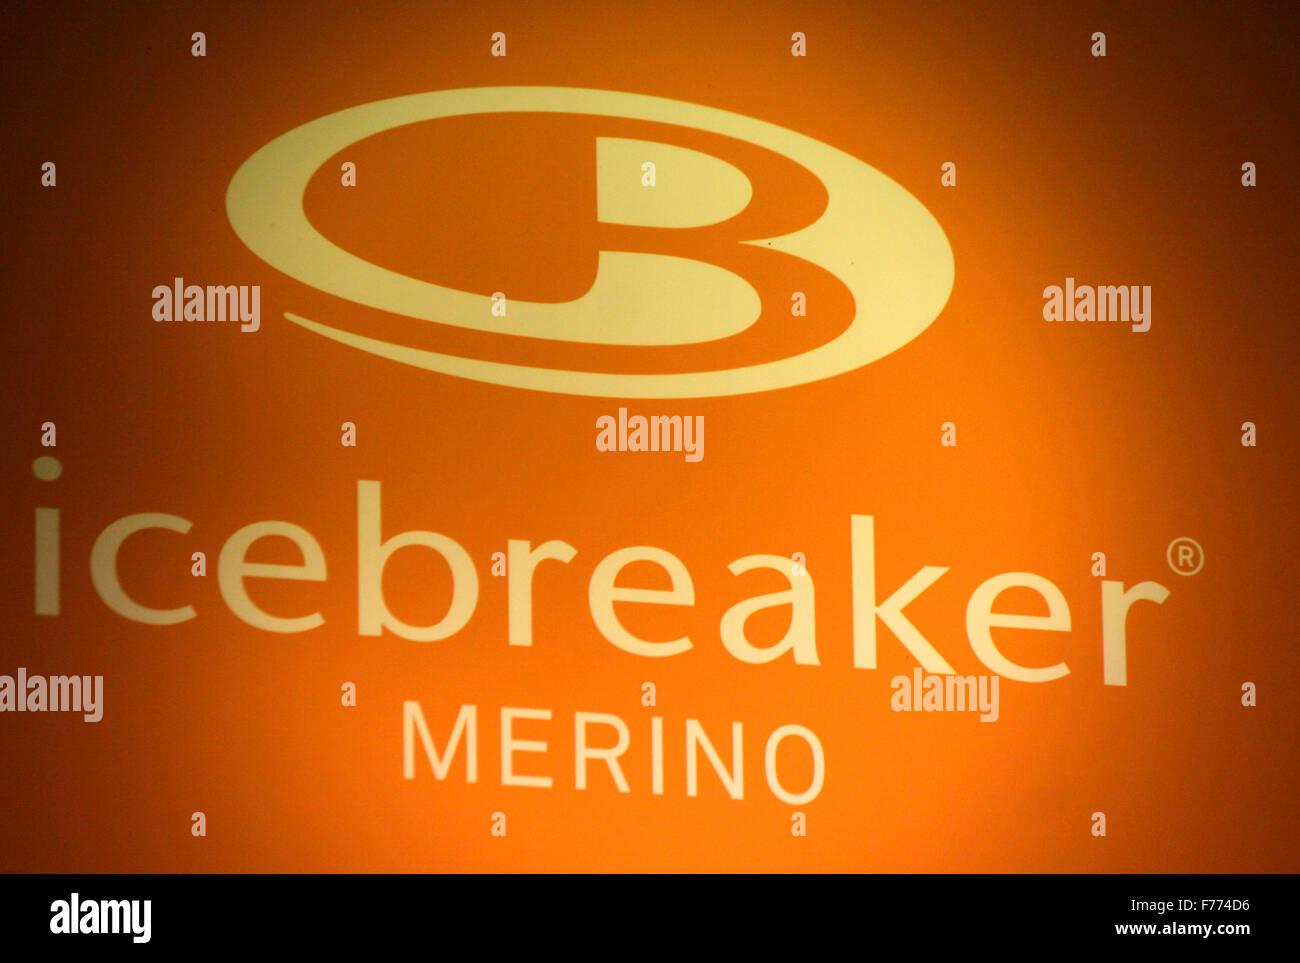 Markennamen: 'Icebreaker Merino', Chamonix, Frankrfeich. - Stock Image